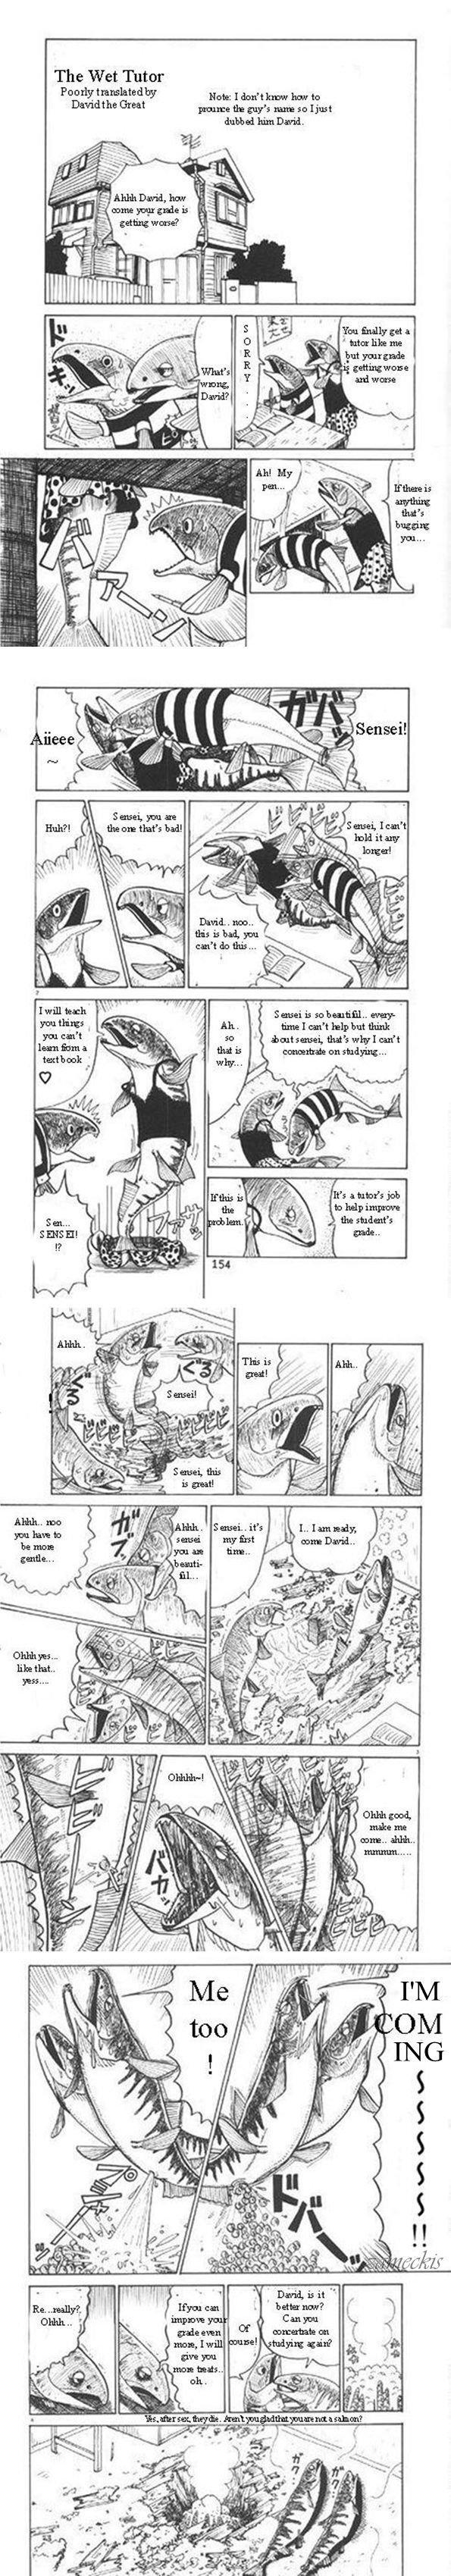 wat. teh description? click for detail i lied again lol how do i get fronds?. manga random wat